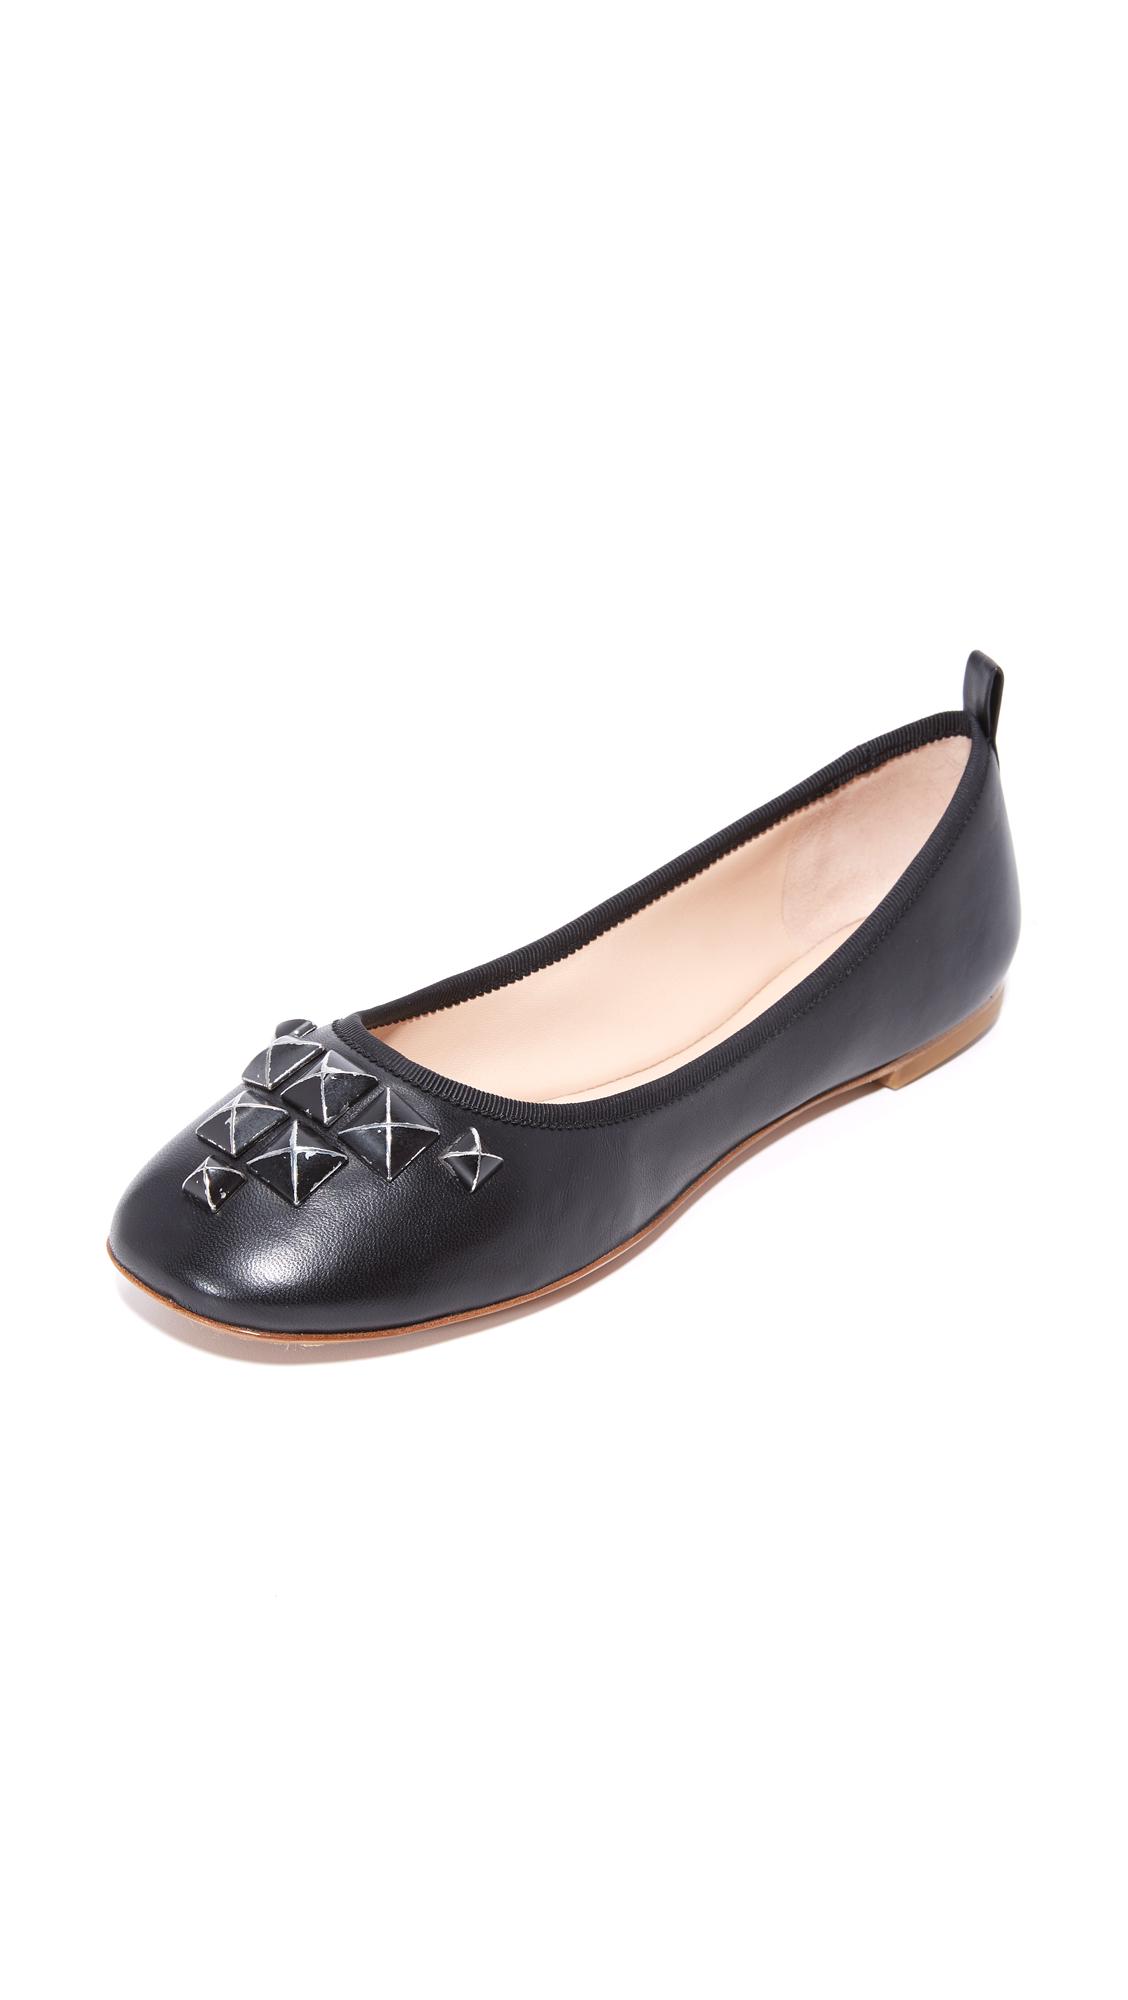 marc jacobs female marc jacobs cleo studded ballerina flats black